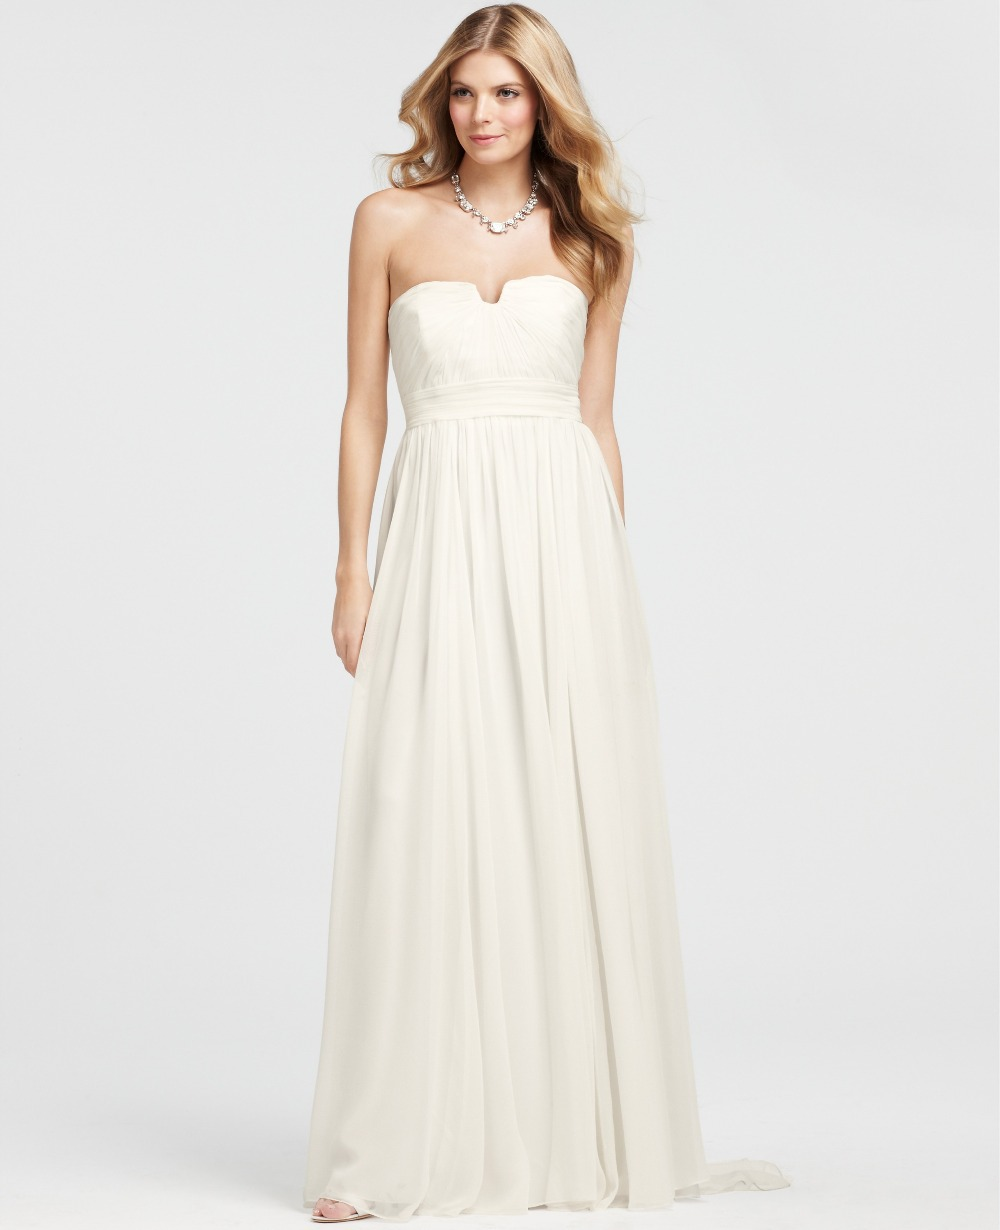 Formal party gown vestido de festa floor-length 2018 robe soiree free Shipping pleat bridal long elegant bridesmaid dresses